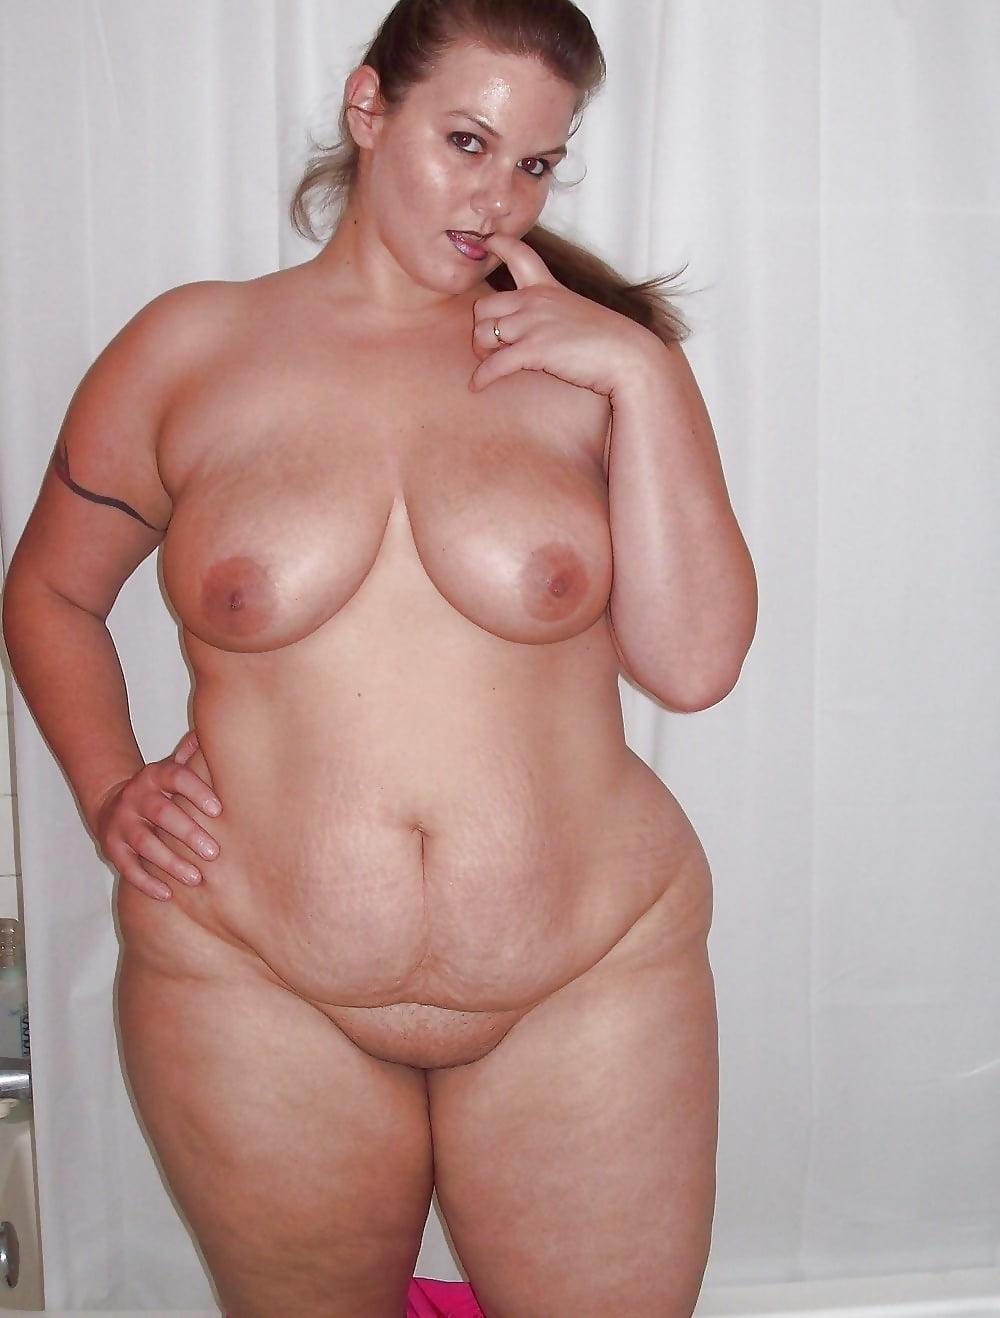 Small Tit Brunette Teen